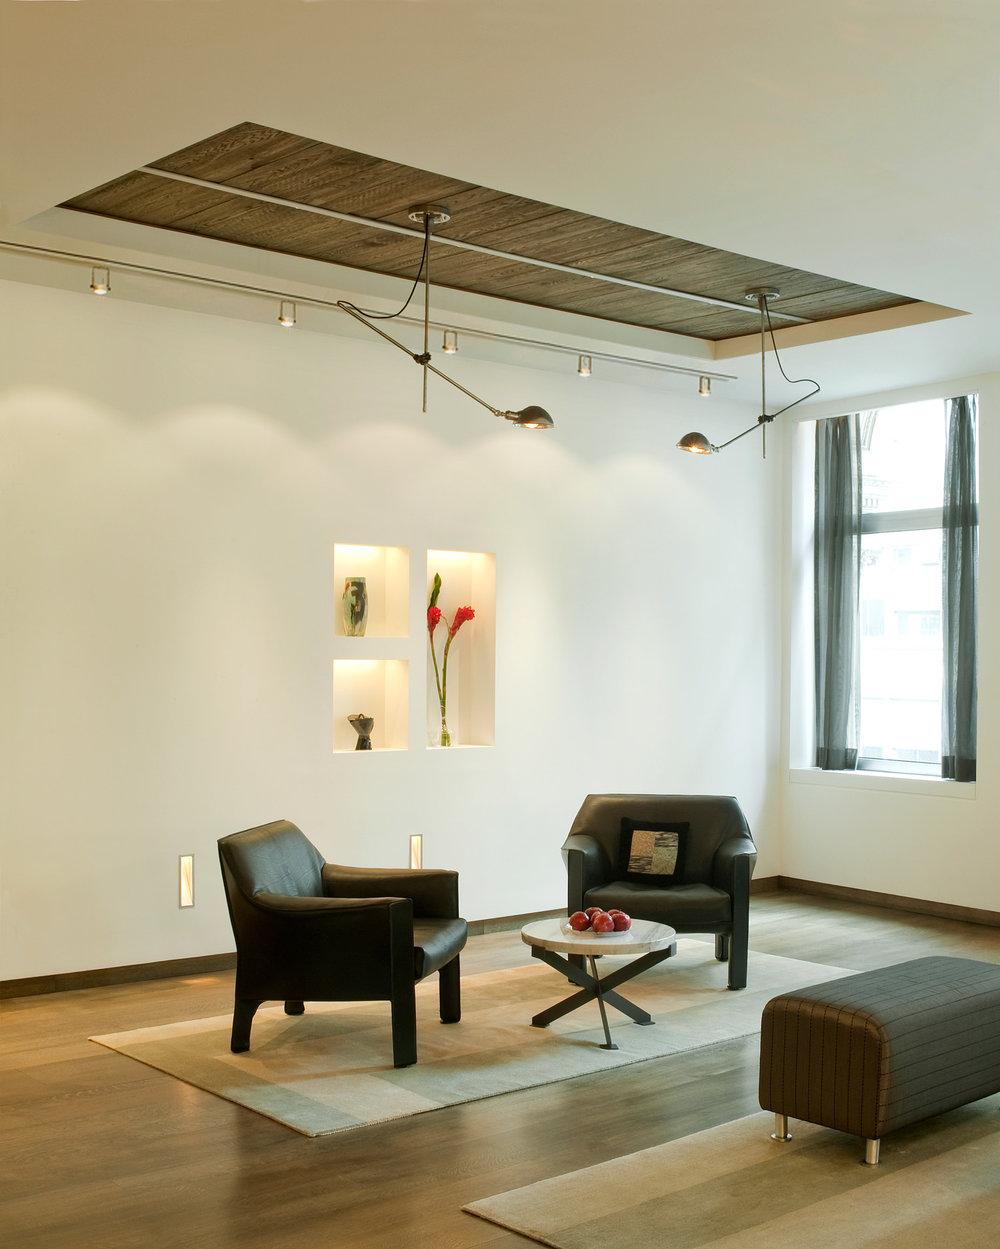 NYC Loft Renovation - Living Room Seating